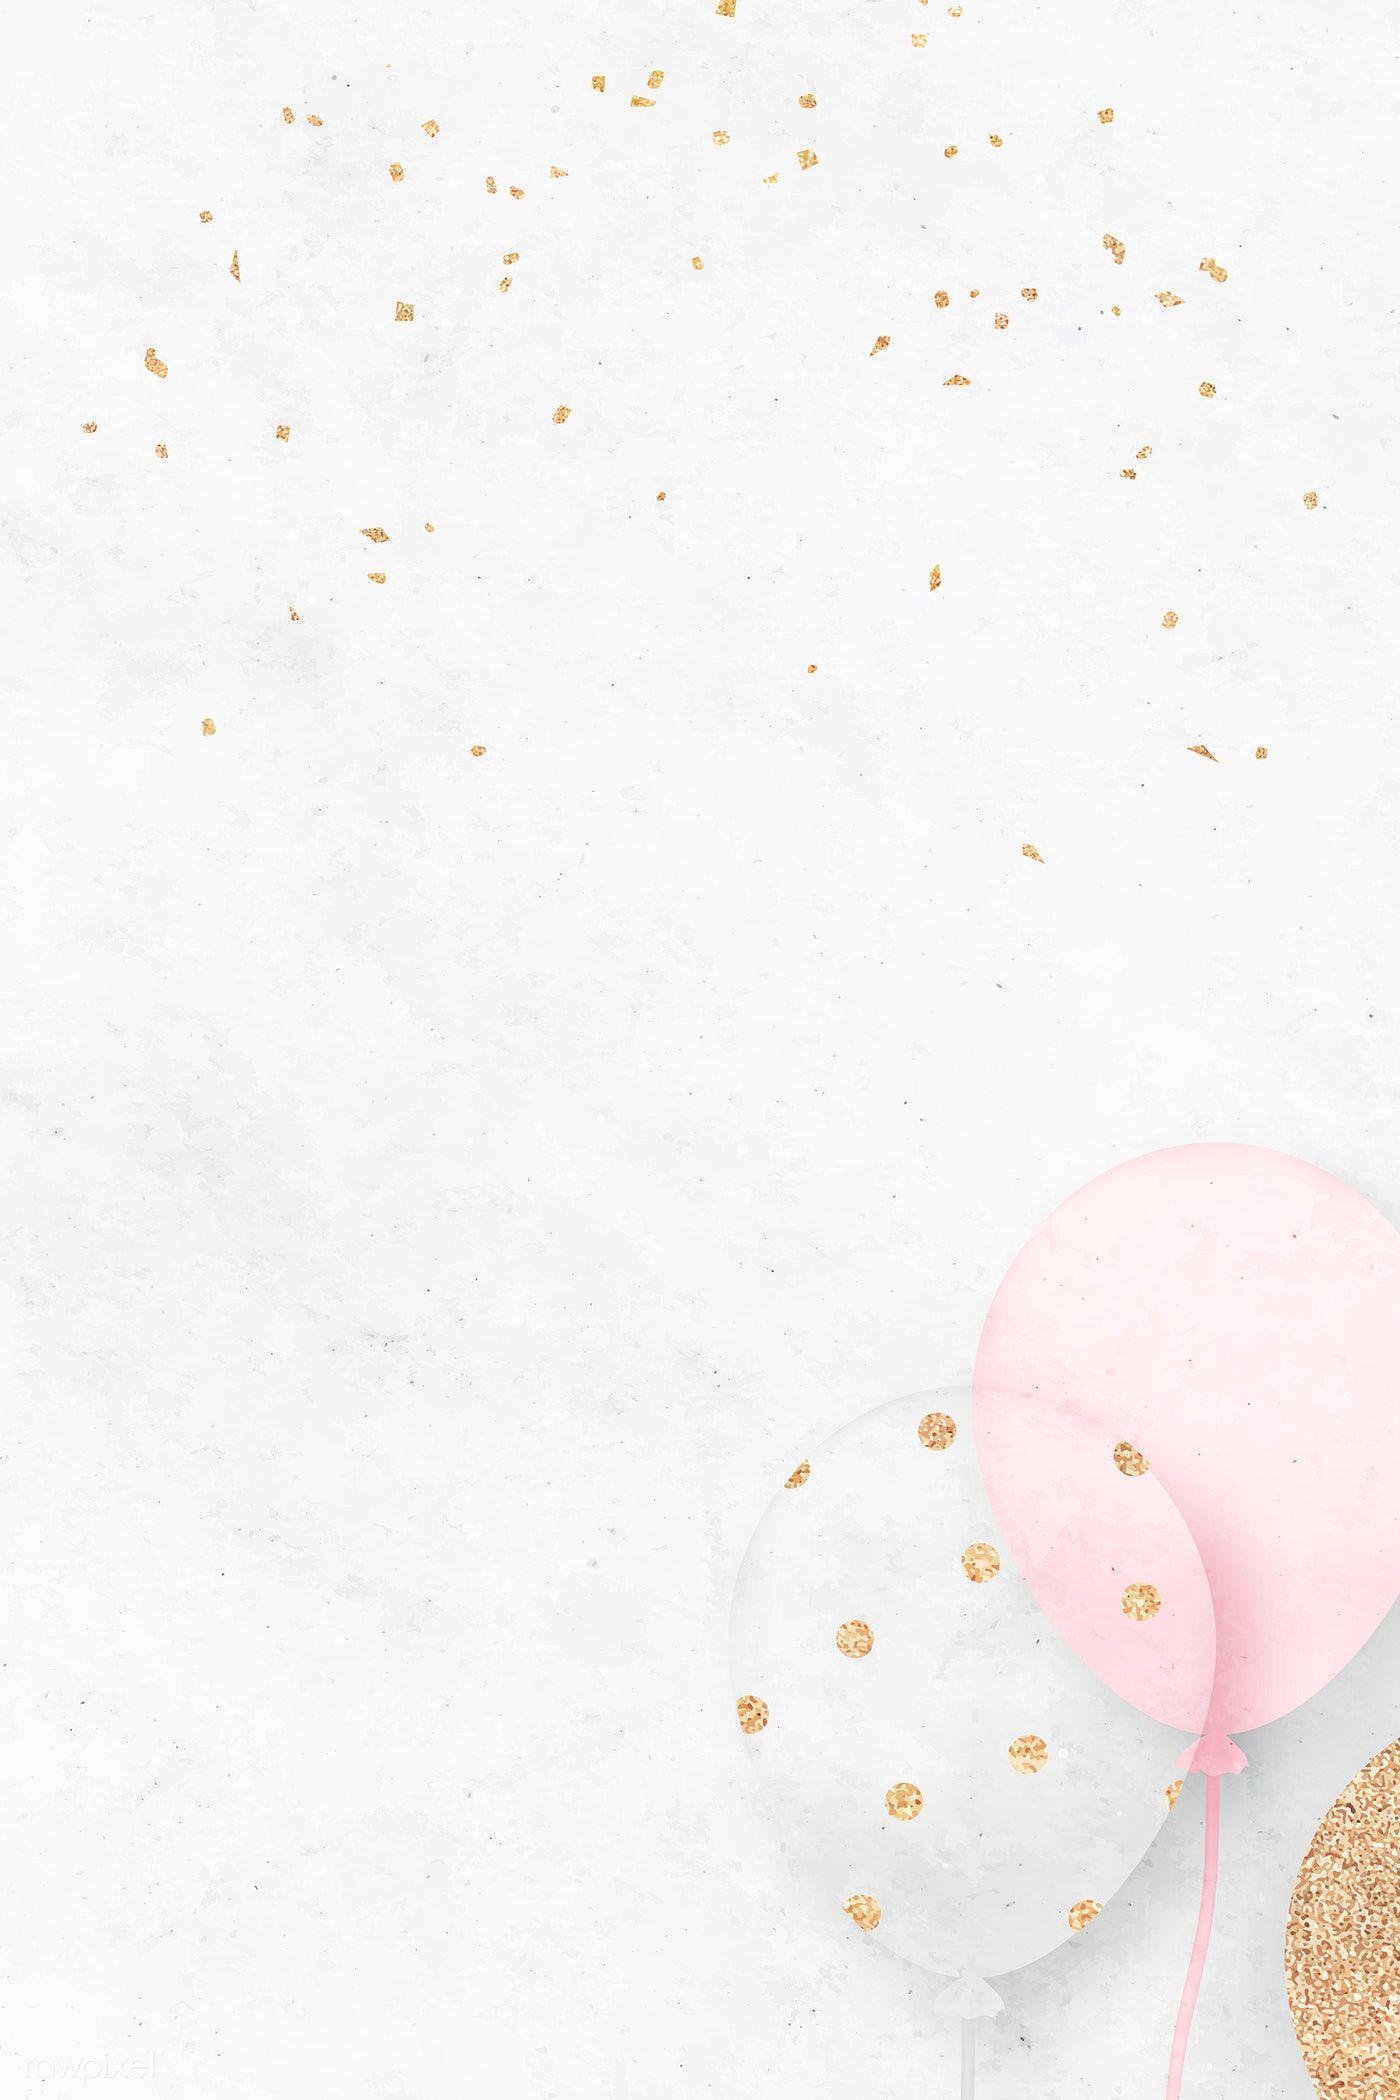 White festive background template vector | premium image by rawpixel.com / NingZk V.